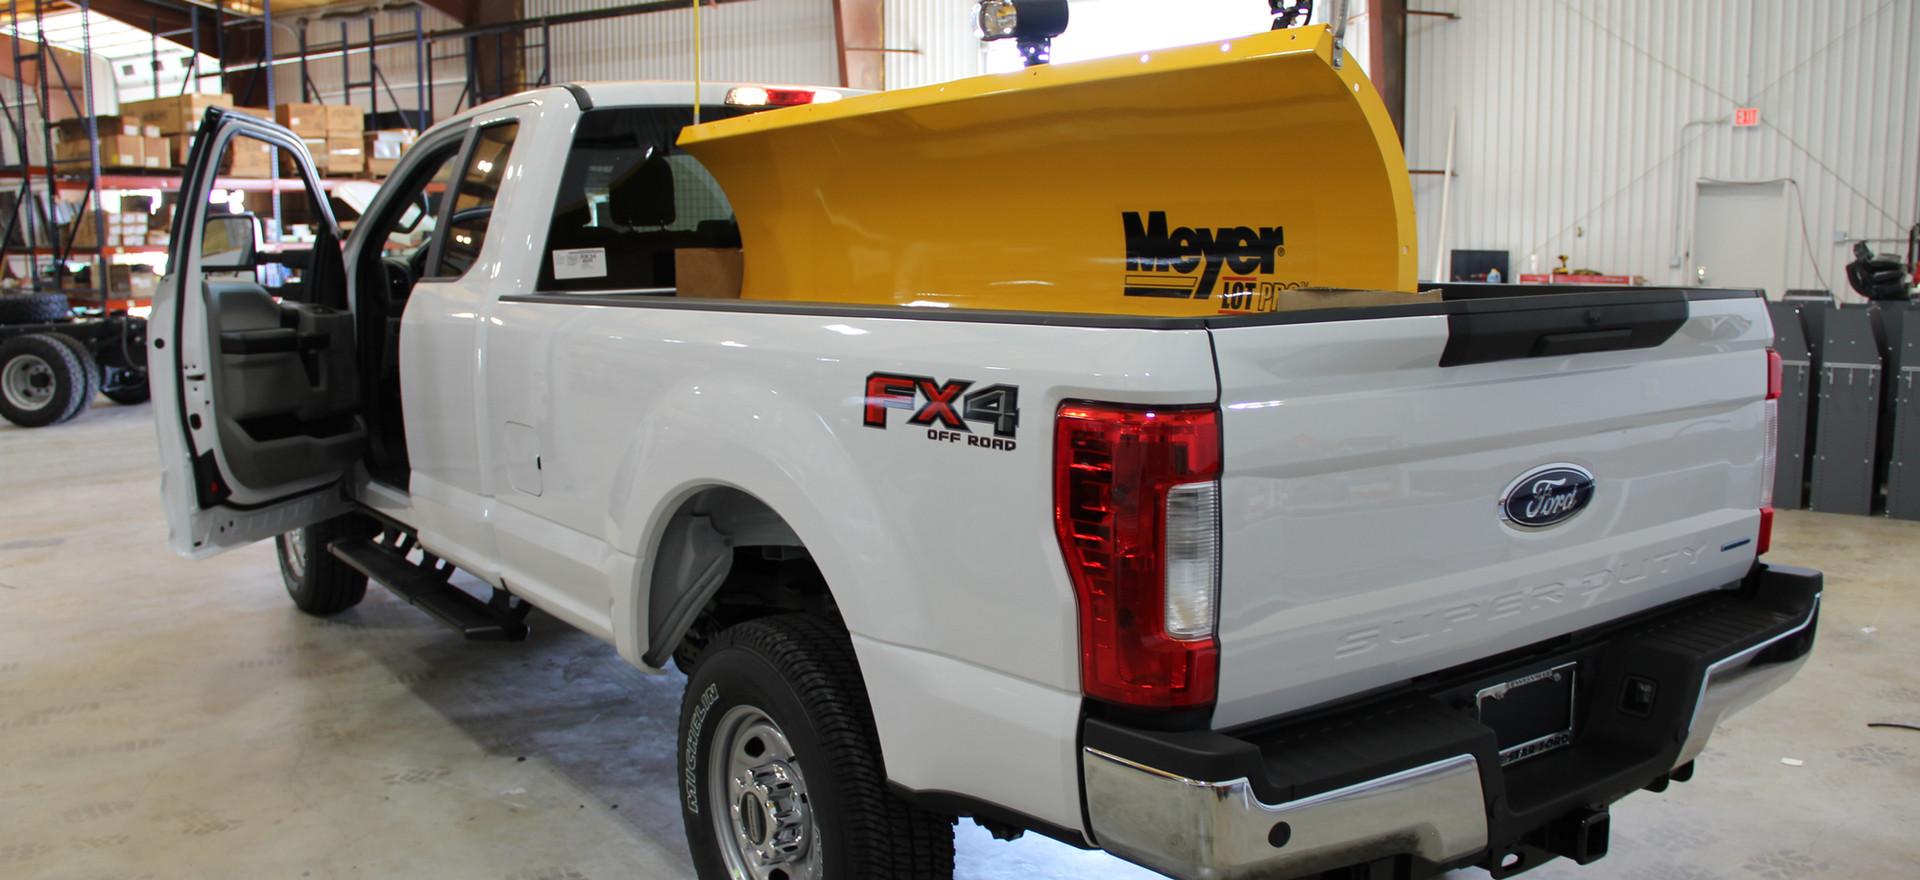 Snow Plow Back of Truck.JPG